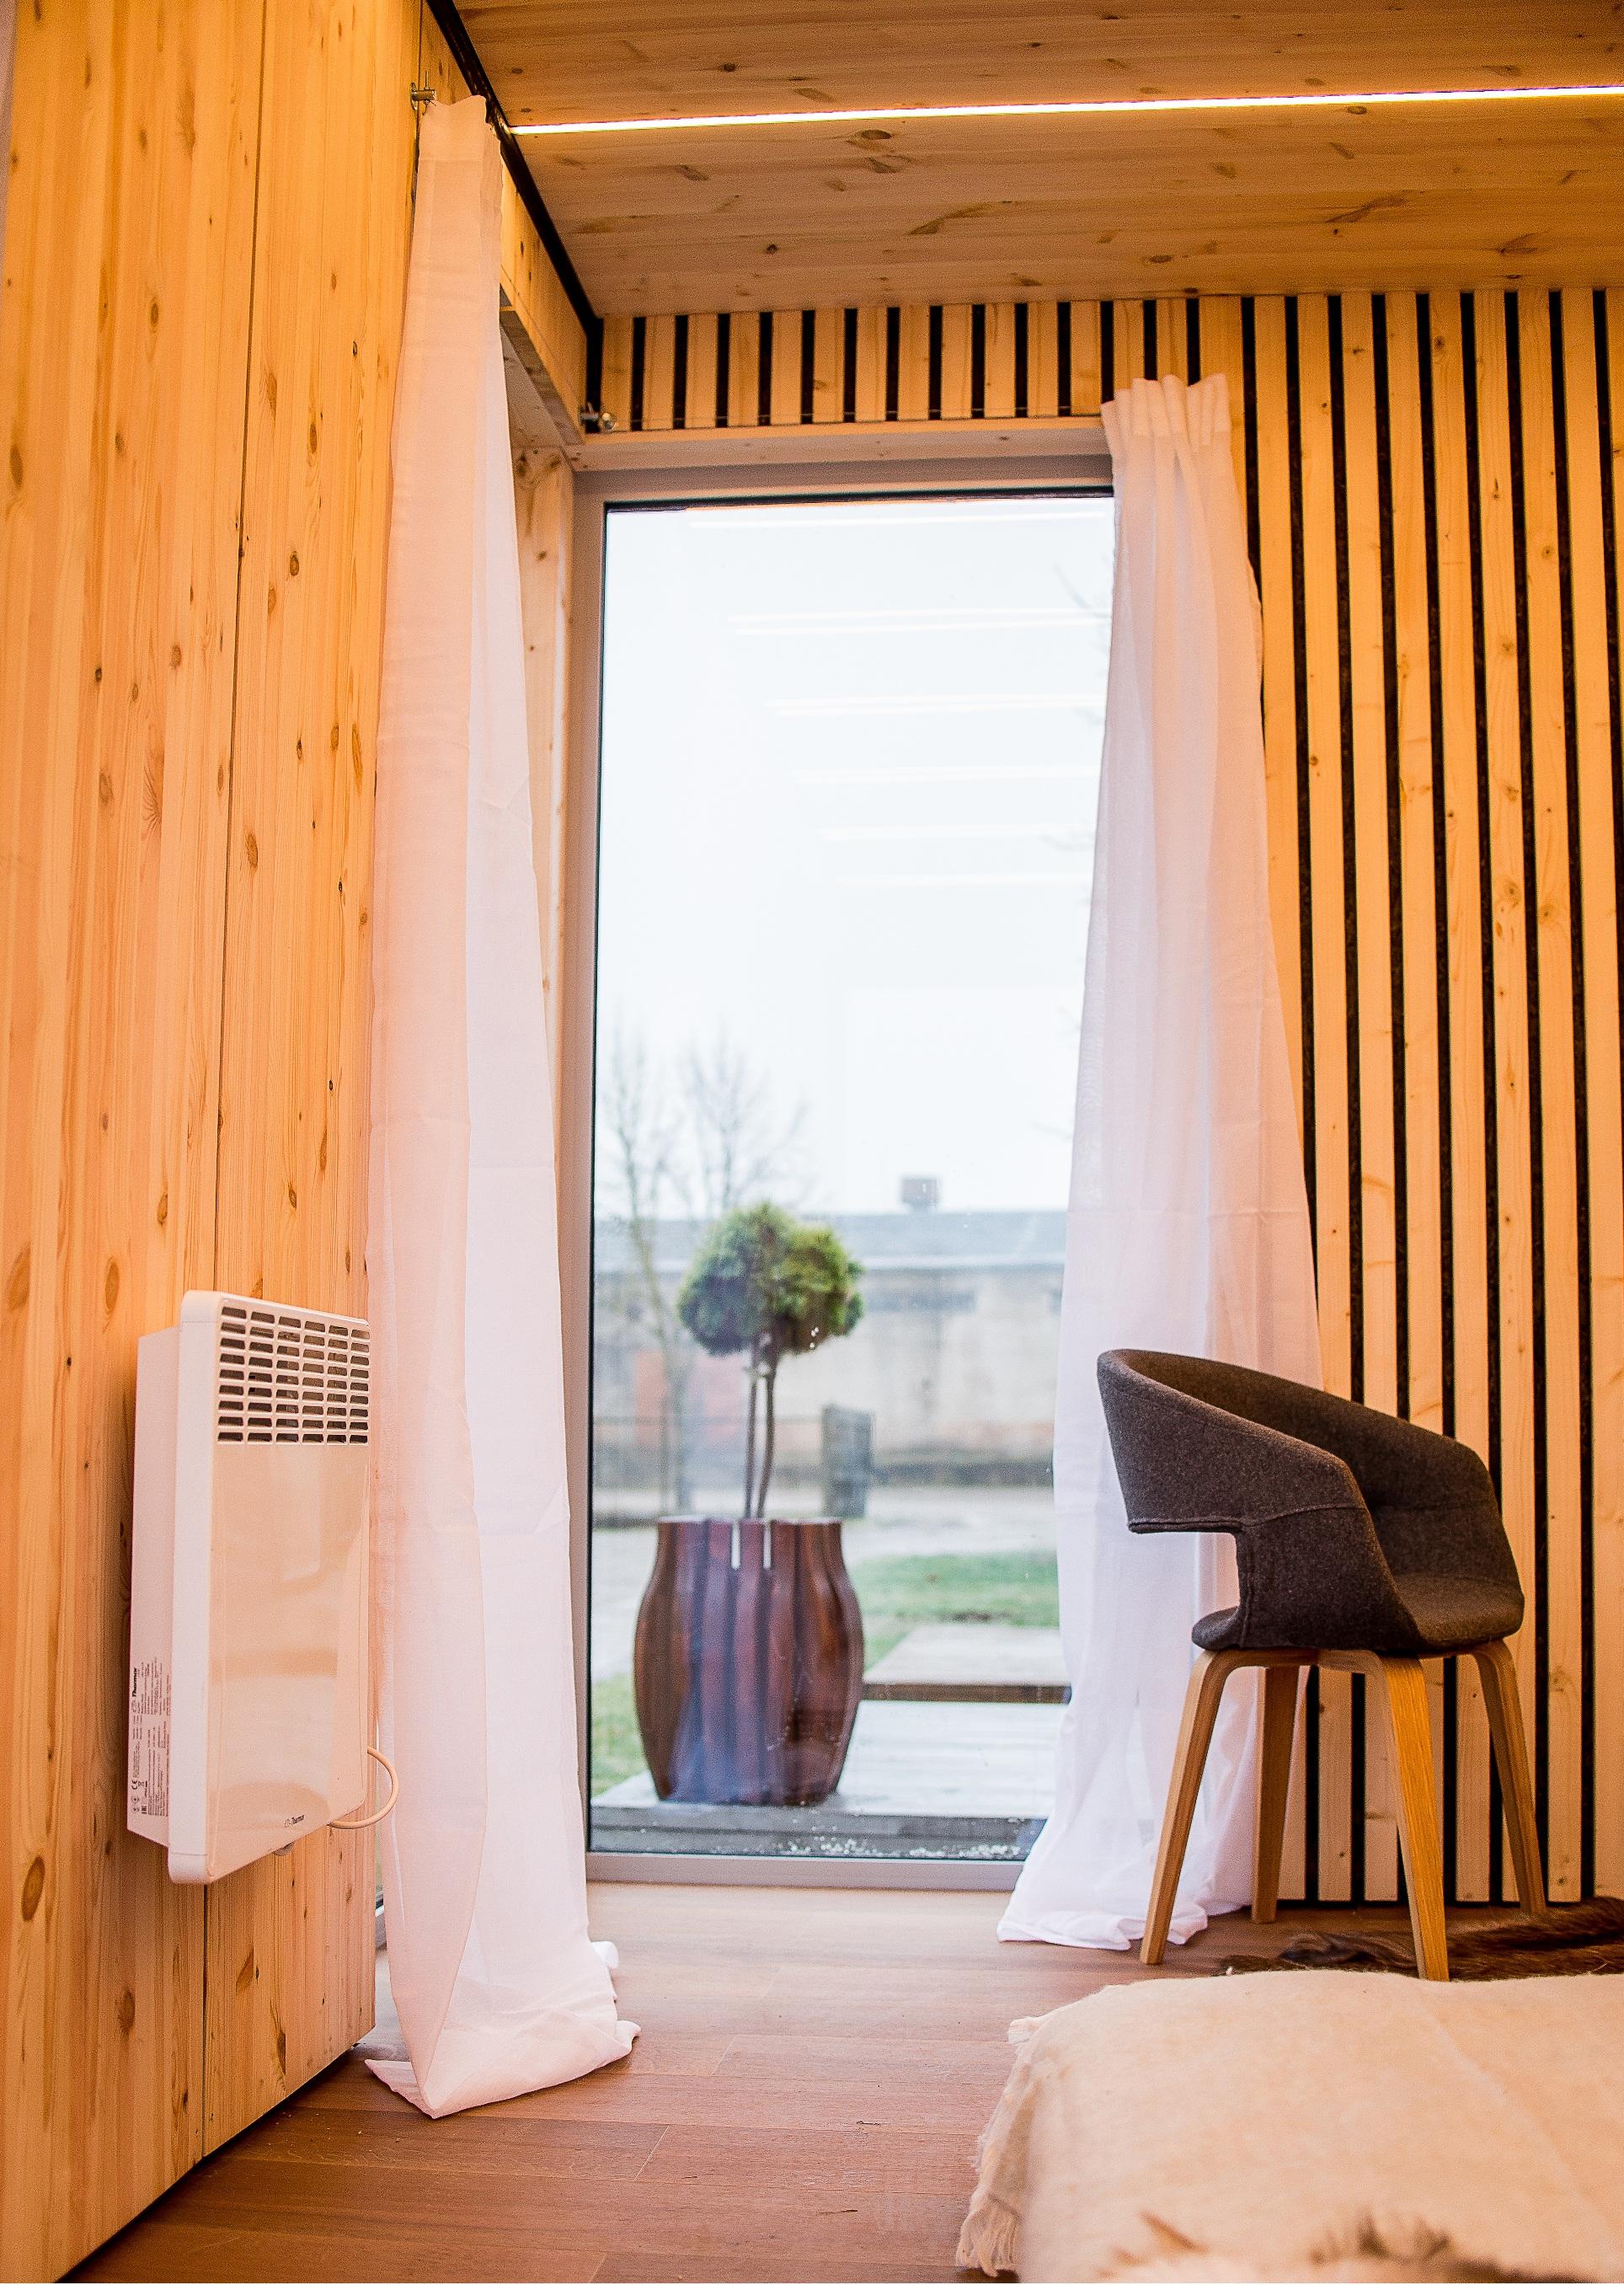 Lot 30192 - V Brand New Fantastic Modern 4m x 3m Garden Cube Perfect For Office/Living Accomodation/Summer House